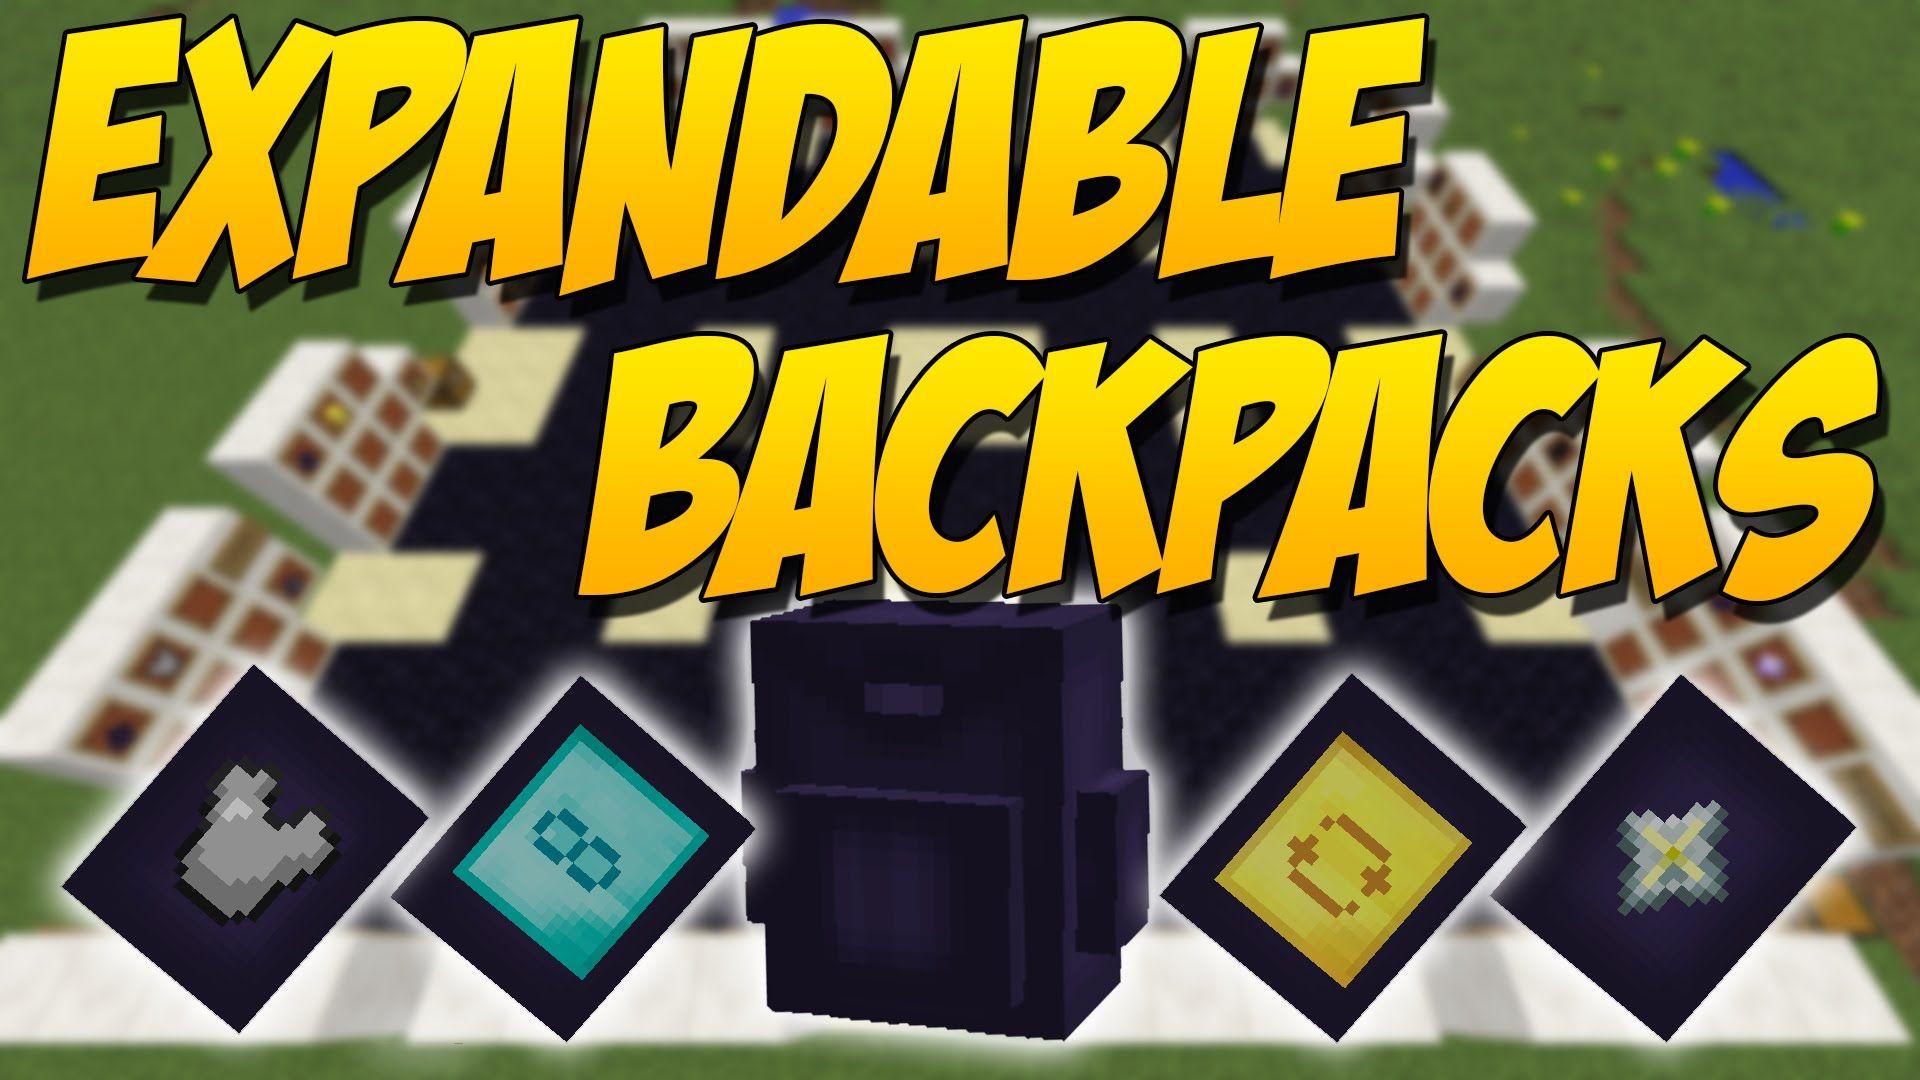 Expandable Backpacks Mod De Mochilas Mejorables Y Agrandables Minecraft Mod 1 9 4 Minecraft Mochilas